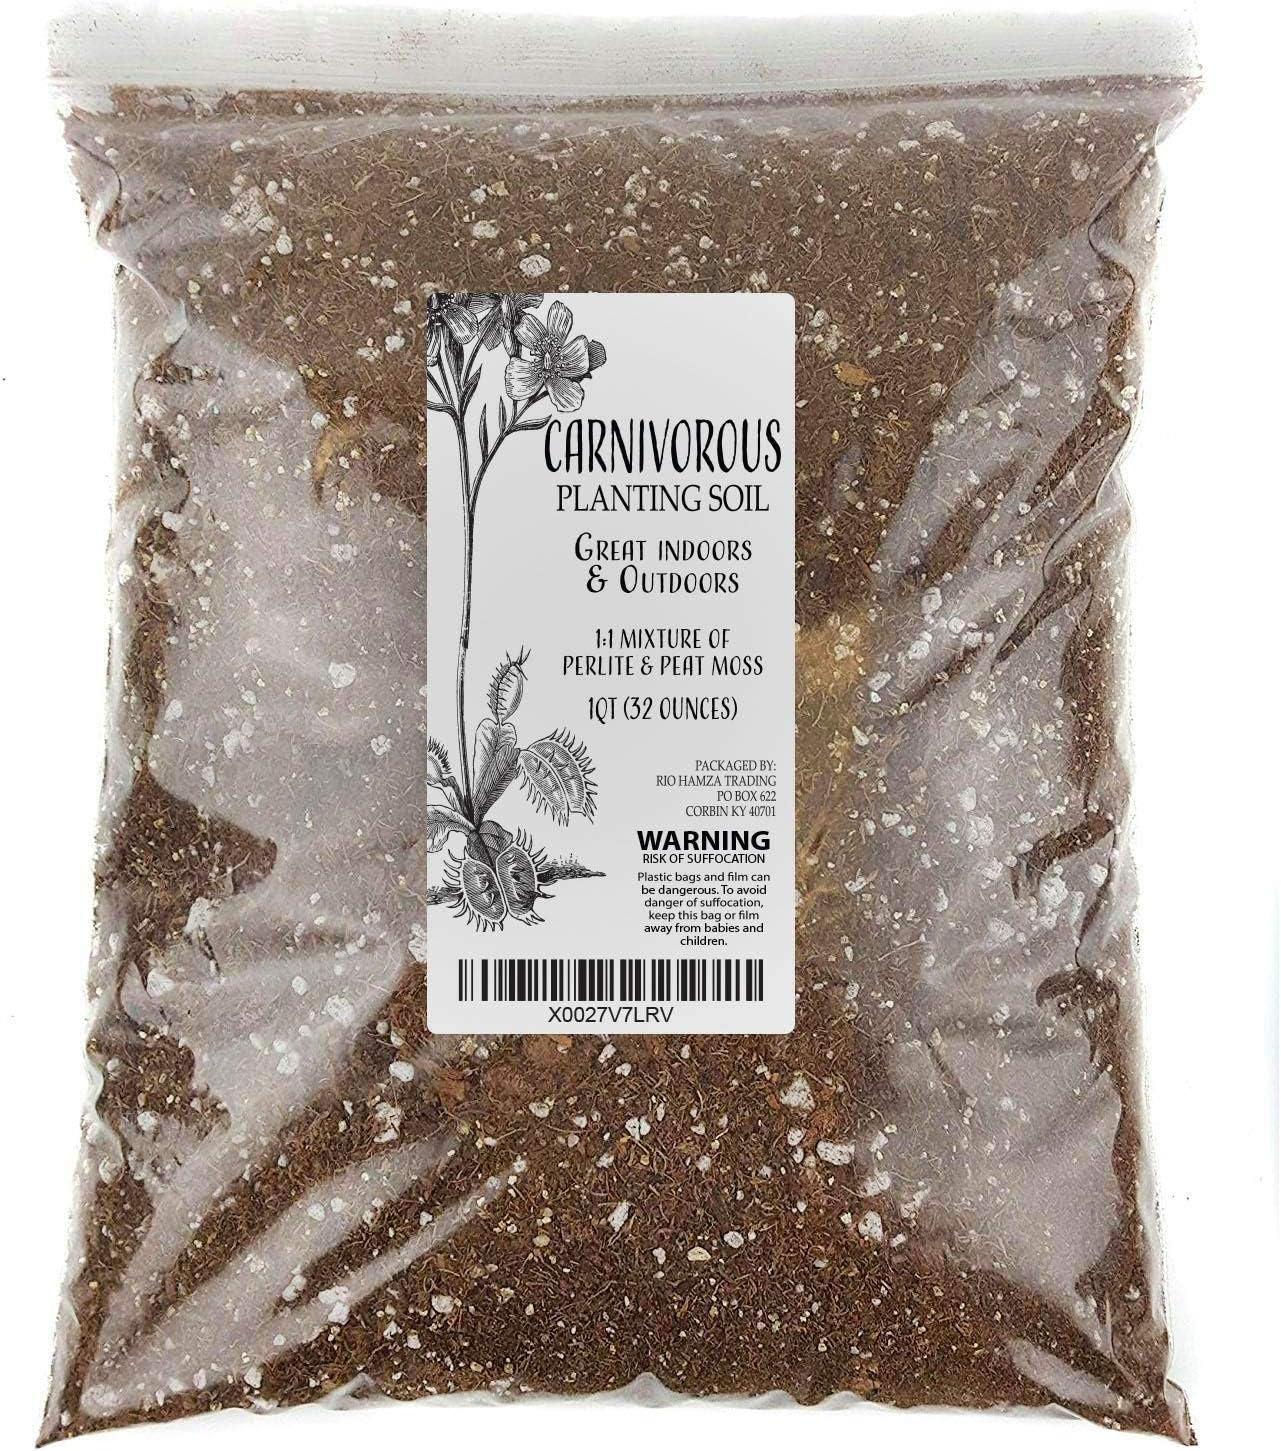 Carnivorous online shopping Plant Soil Very popular! Mix 1 Quart Plants Size Re-Pot Small 1-2